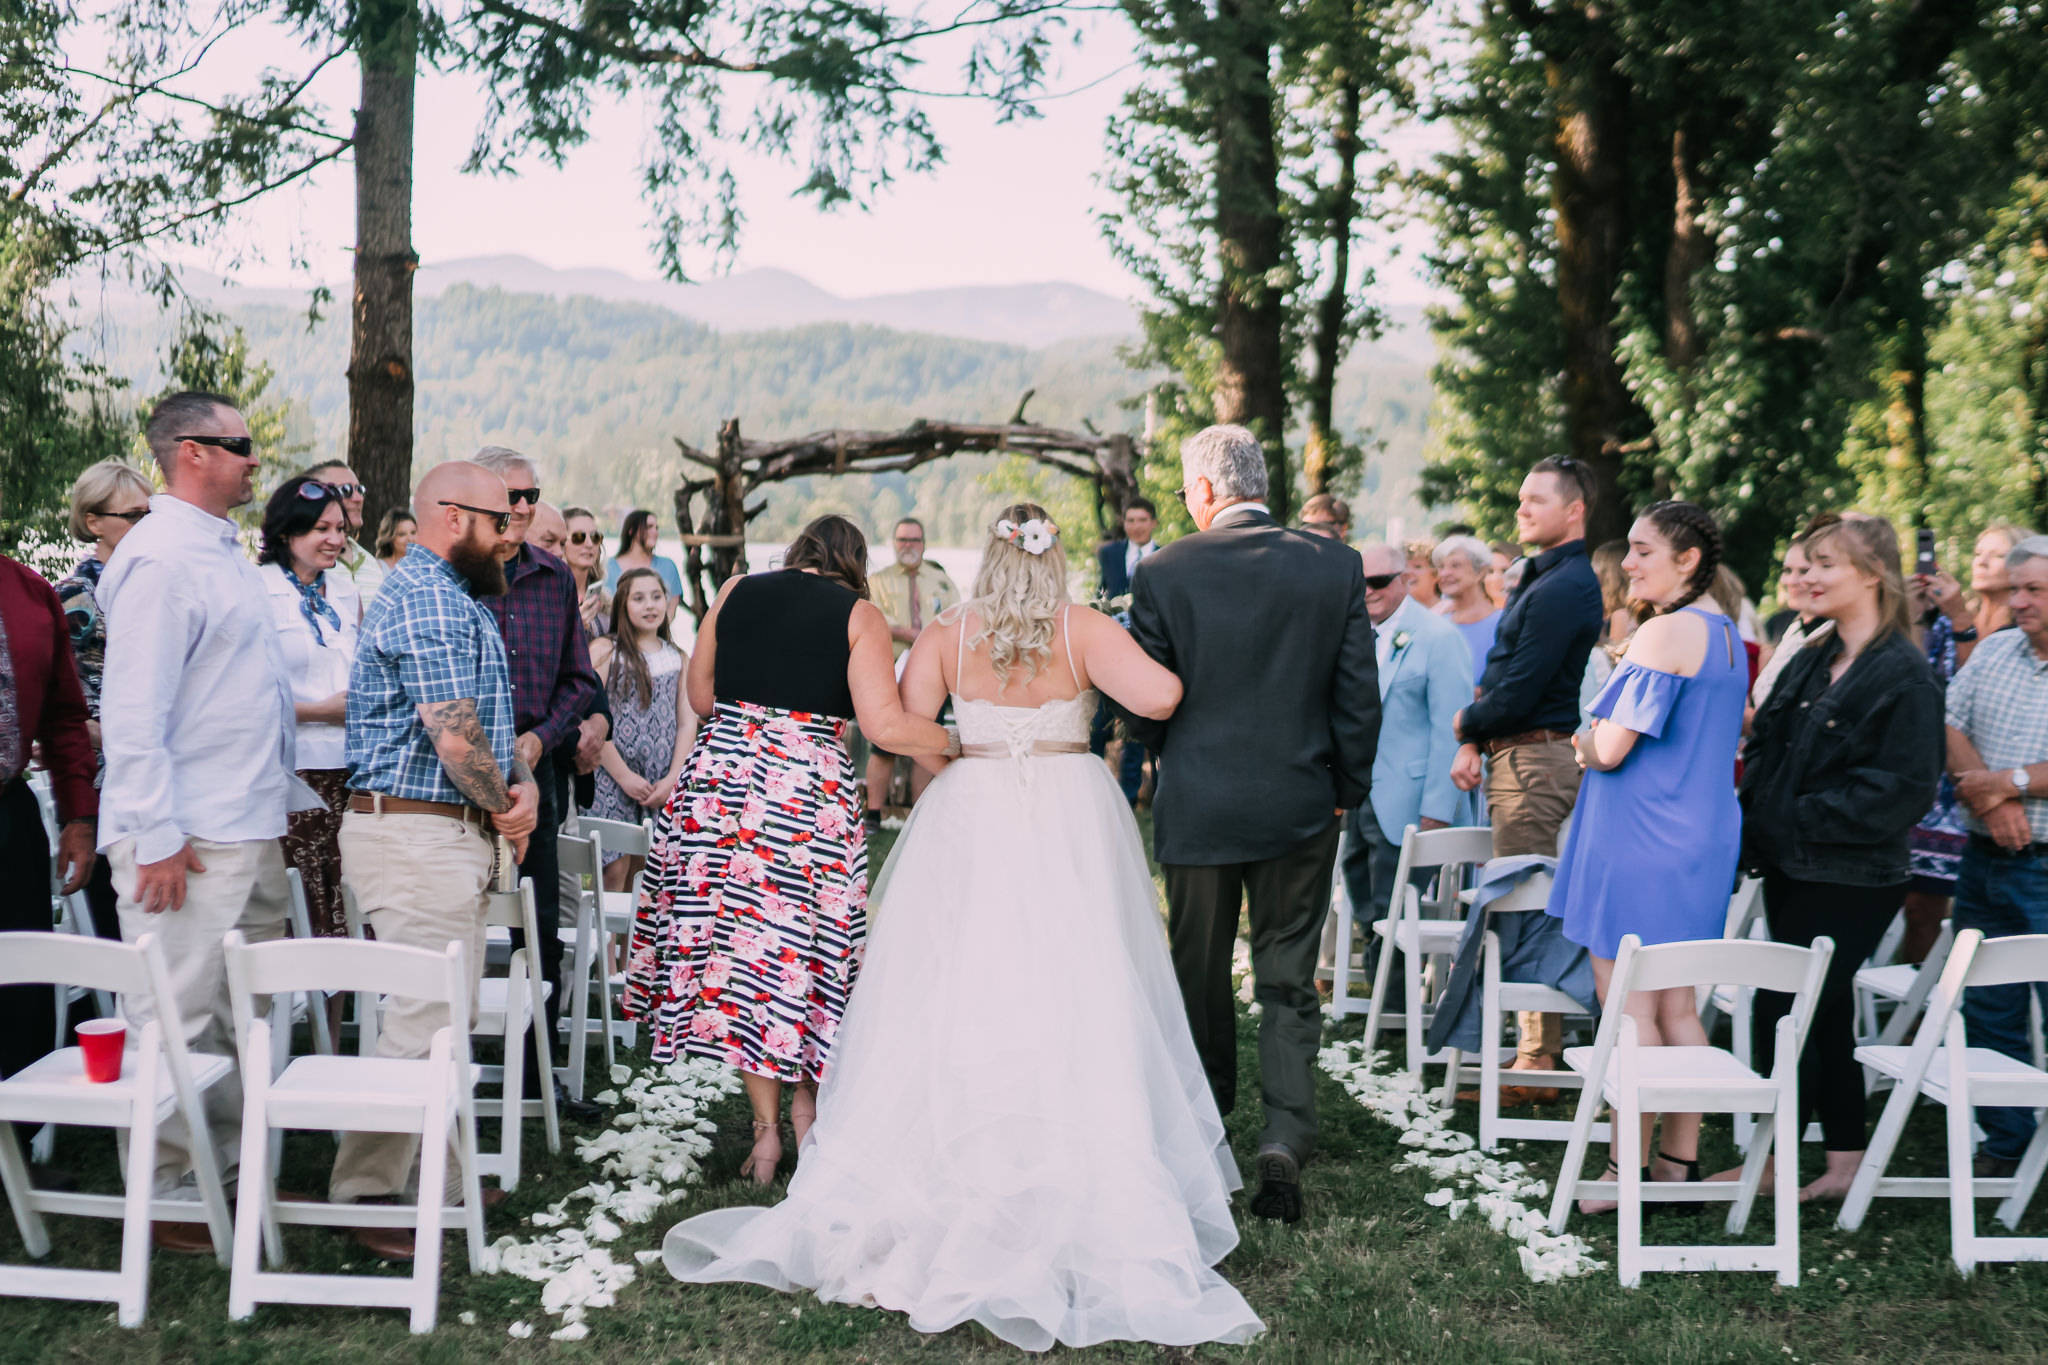 Bride parents walk down aisle wedding ceremony Portland Best Wedding Photographer